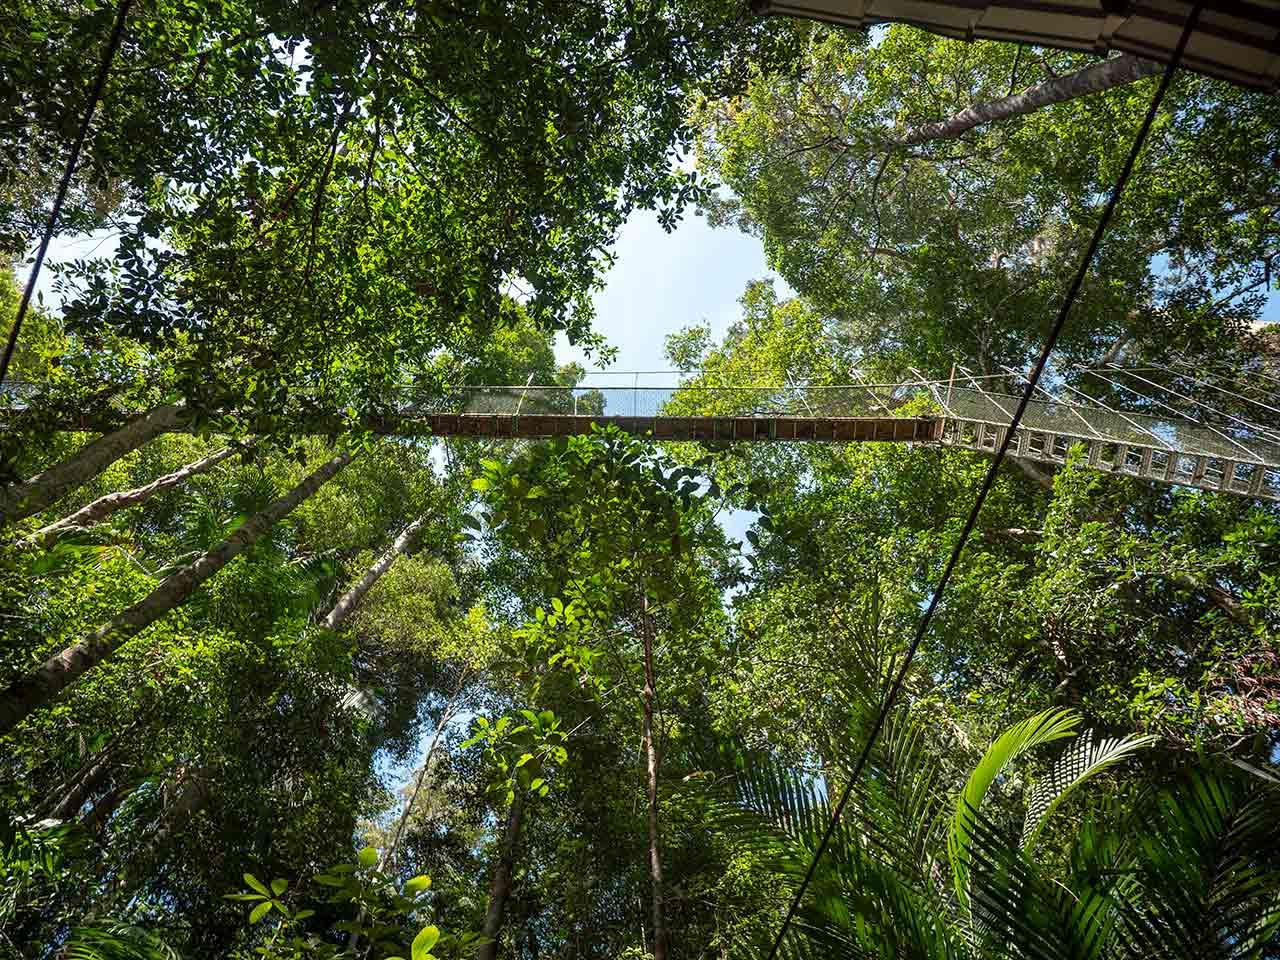 Canopy Walkway von unten